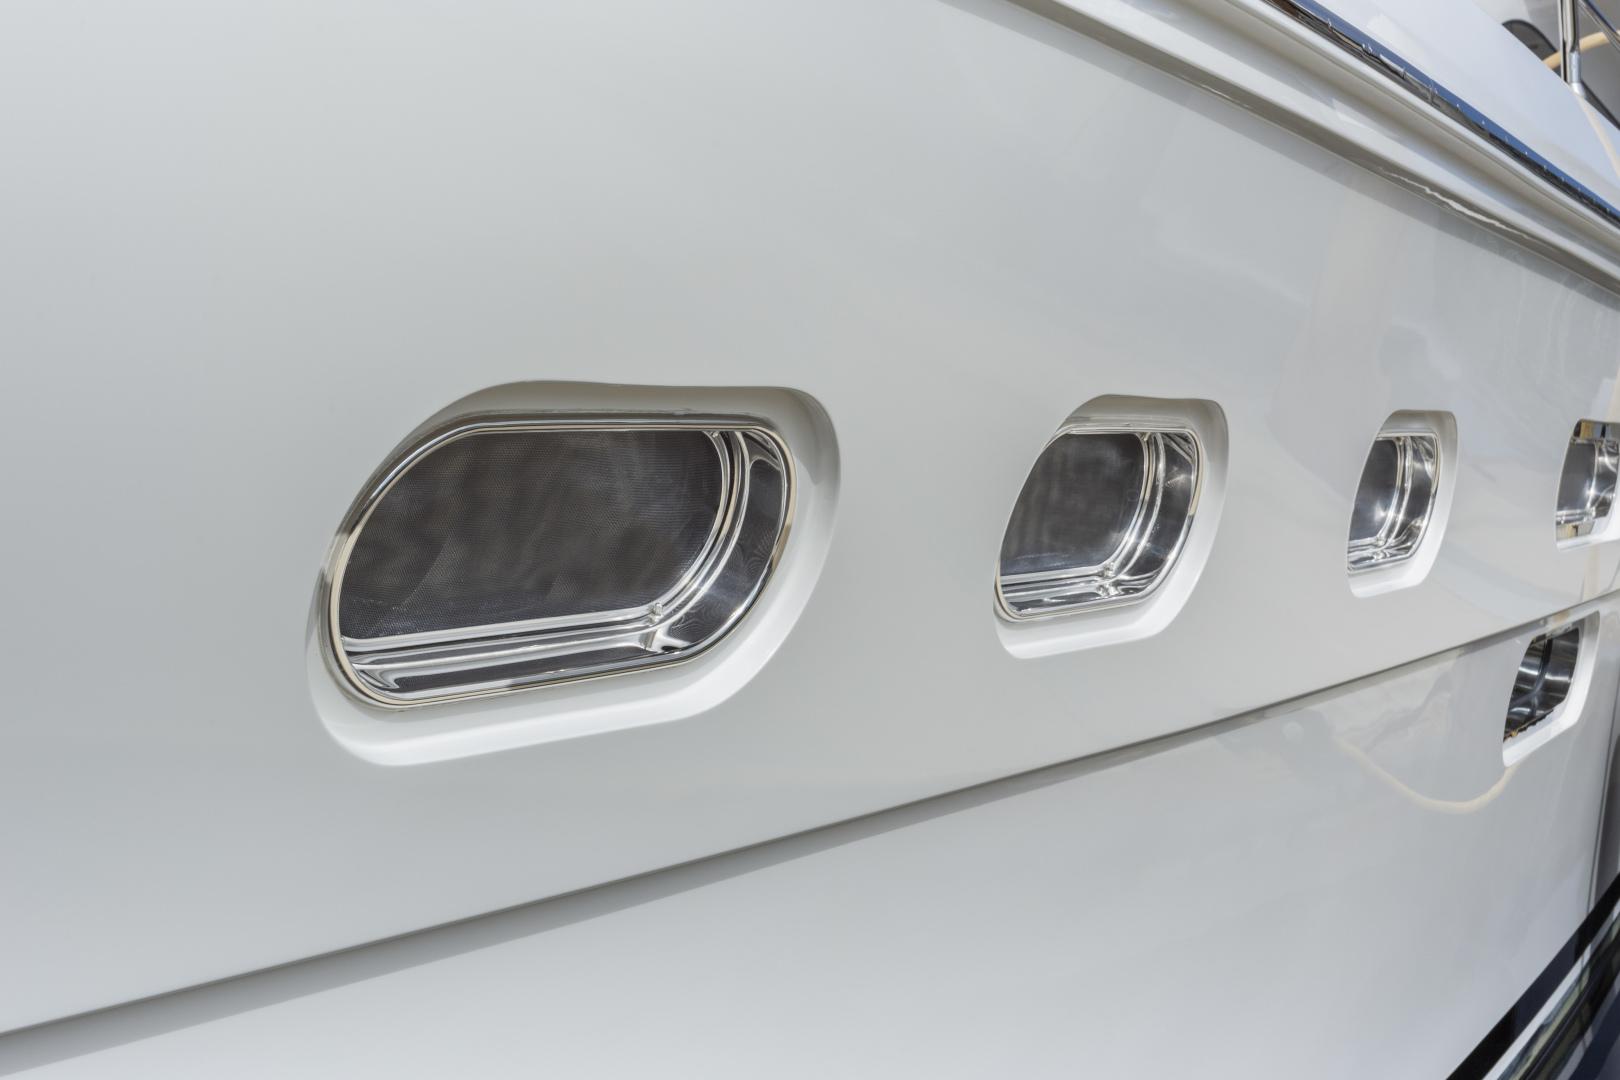 Hampton-76 Skylounge Motoryacht 2014-ODYSEA San Diego-California-United States-HULL-1165192 | Thumbnail